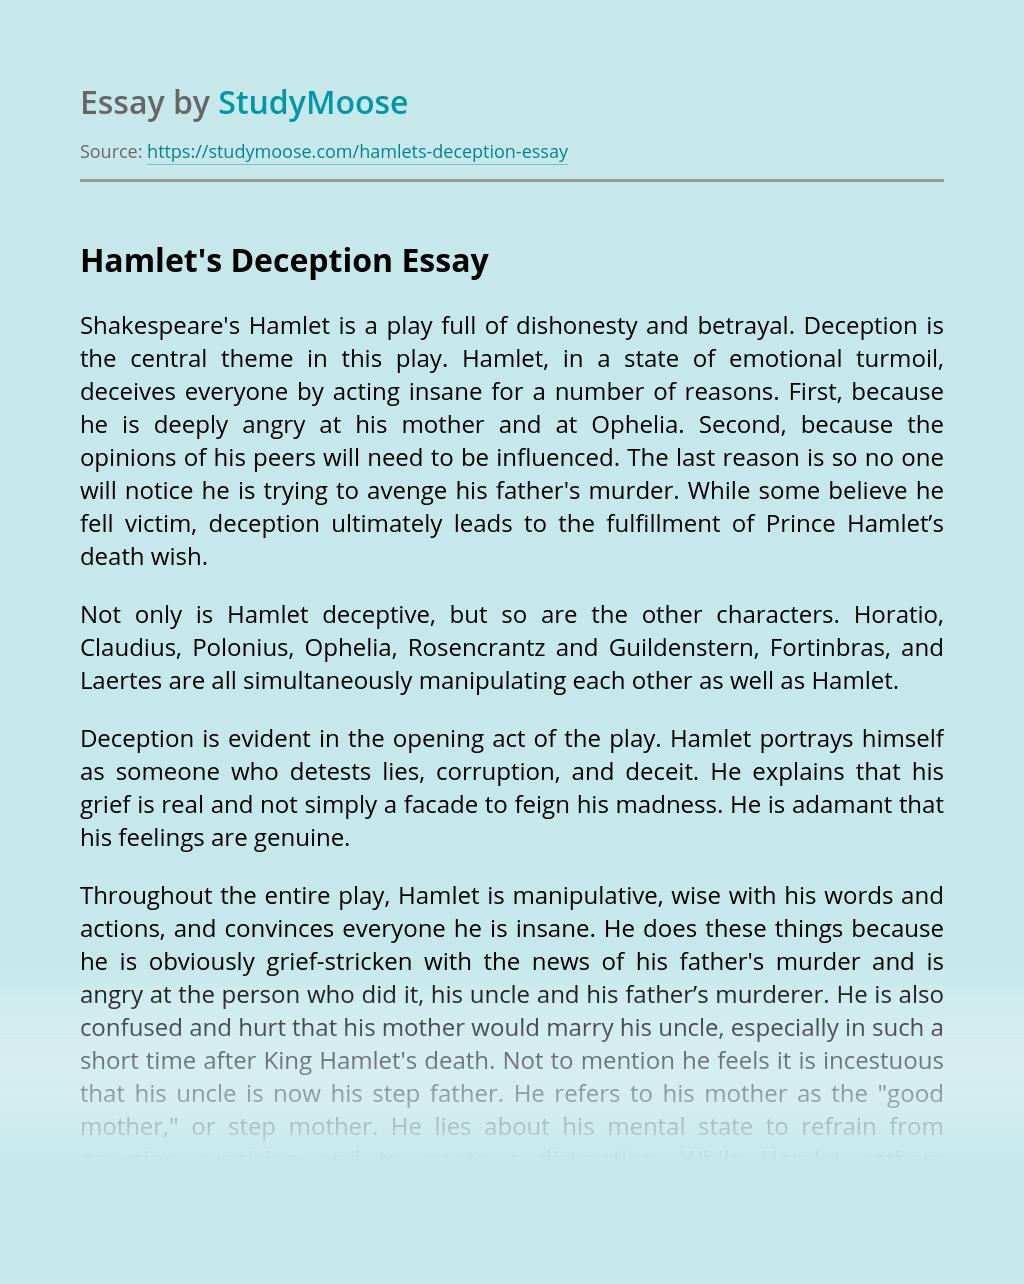 Hamlet's Deception